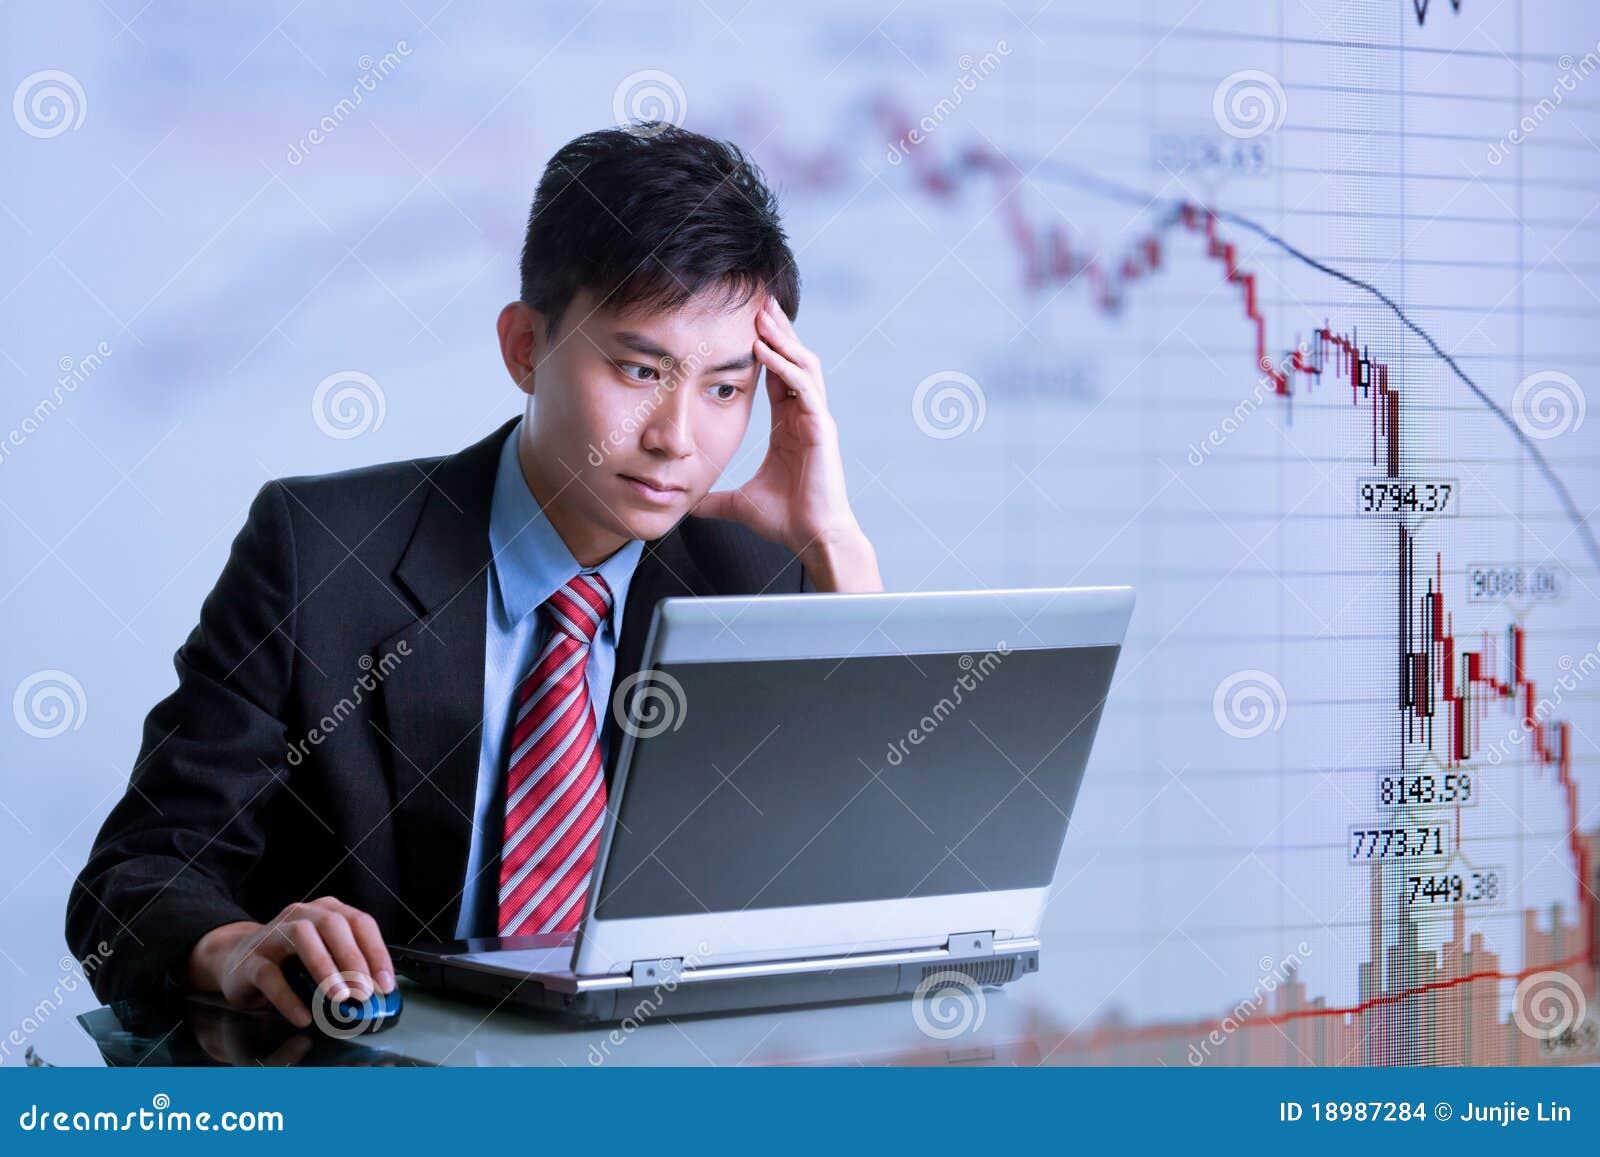 Financial Crisis - Asian Businessman